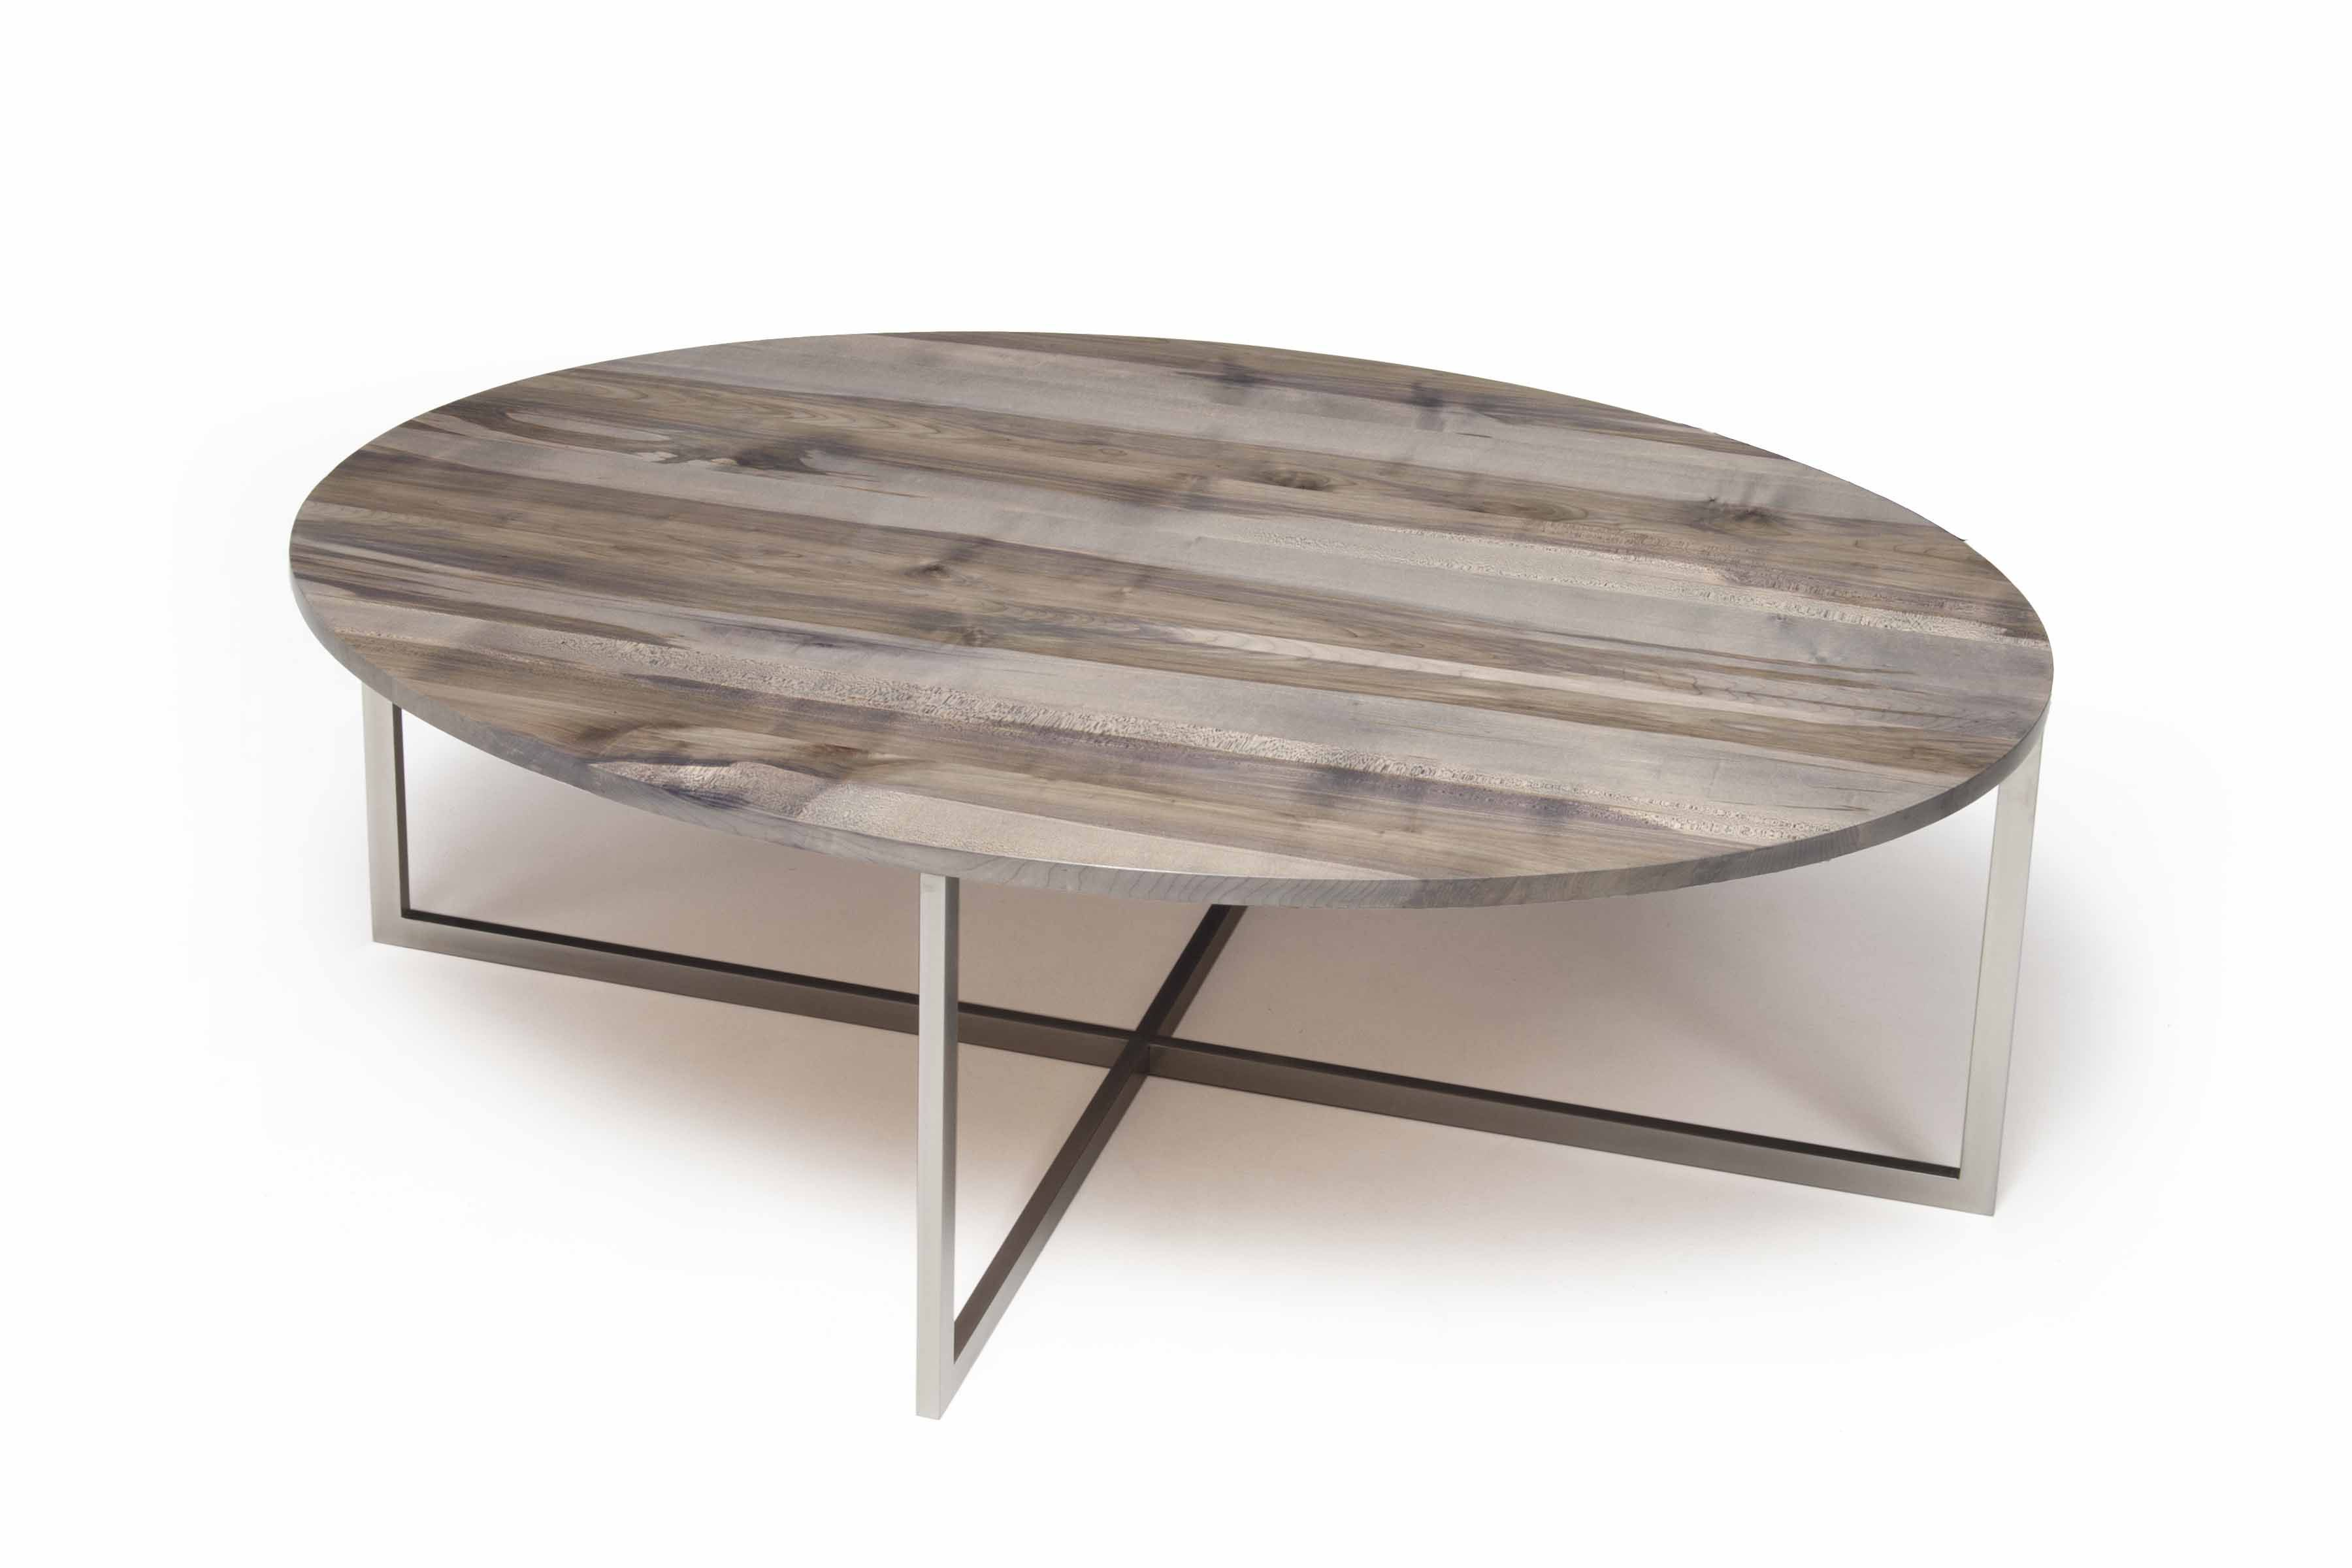 Tod Von Marten maple elipse coffee table | Furniture - Coffee Tables ...